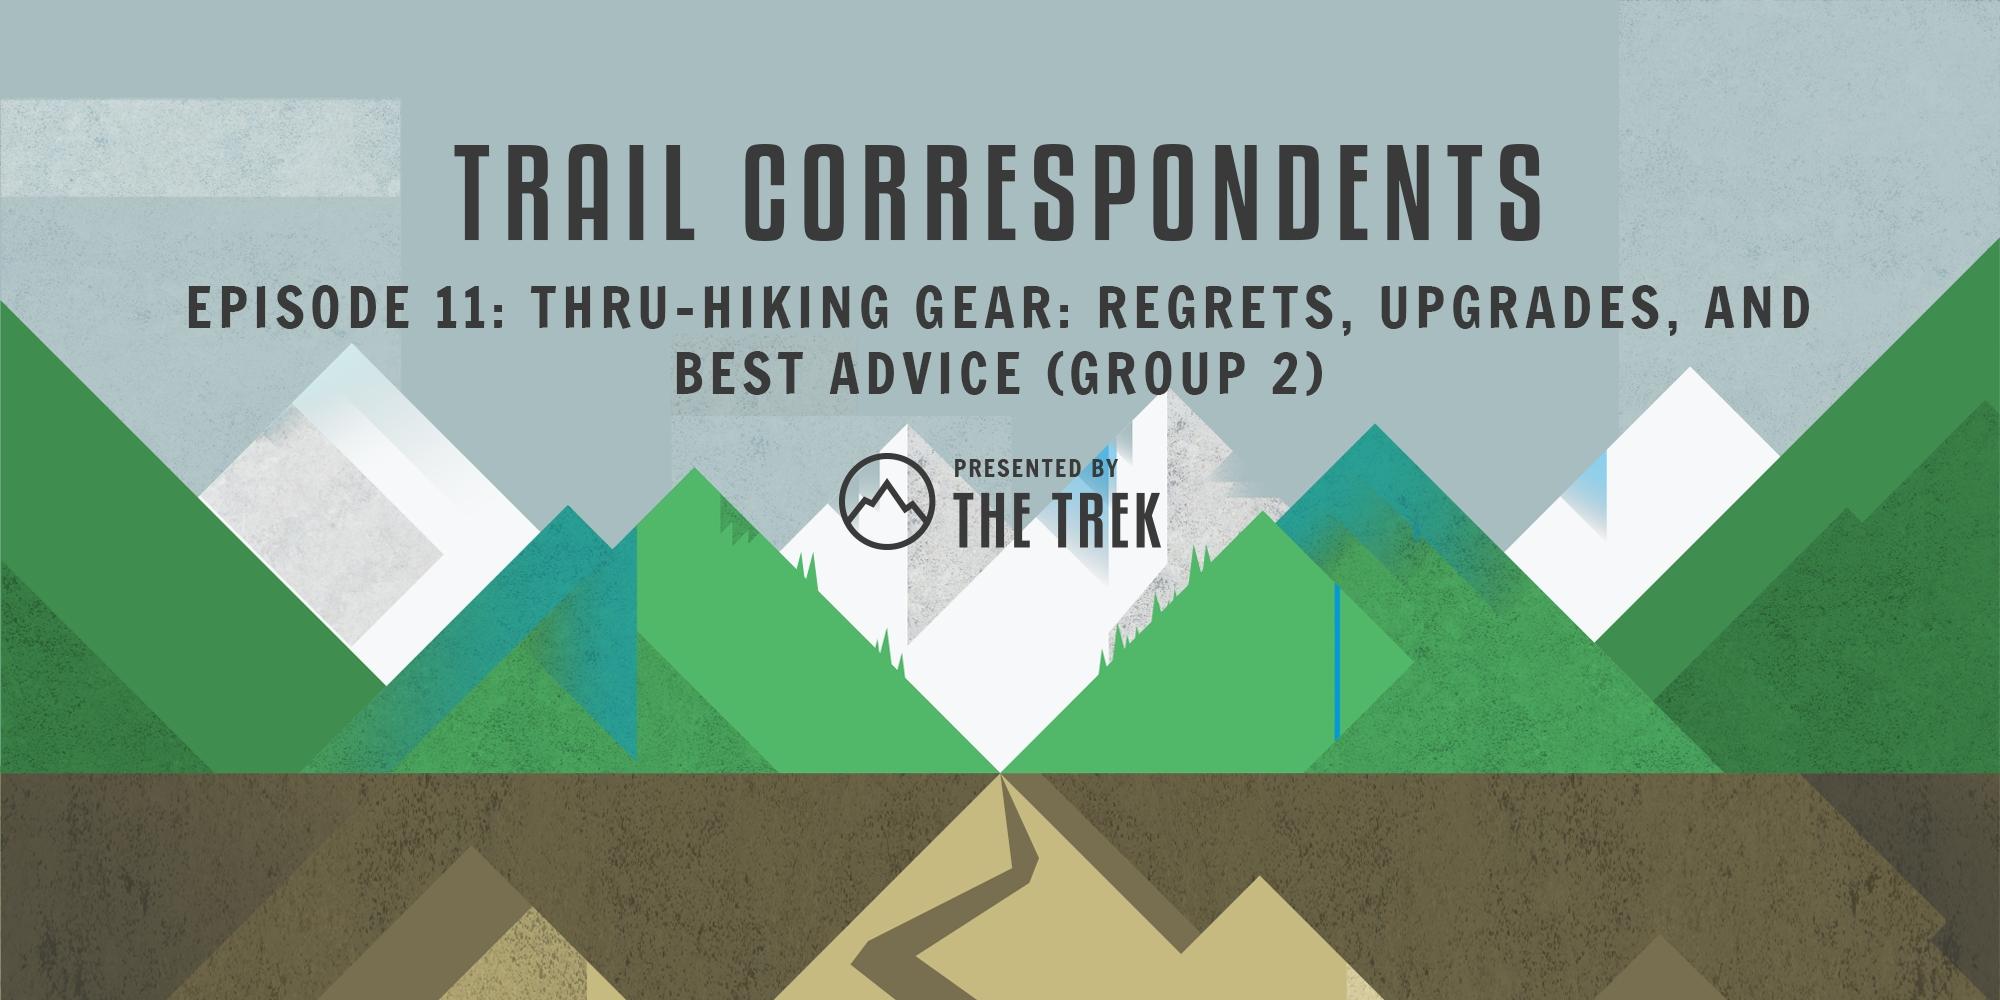 Trail Correspondents #11   Thru-Hiking Gear: Regrets, Upgrades, and Best Advice (Group 2) - The Trek